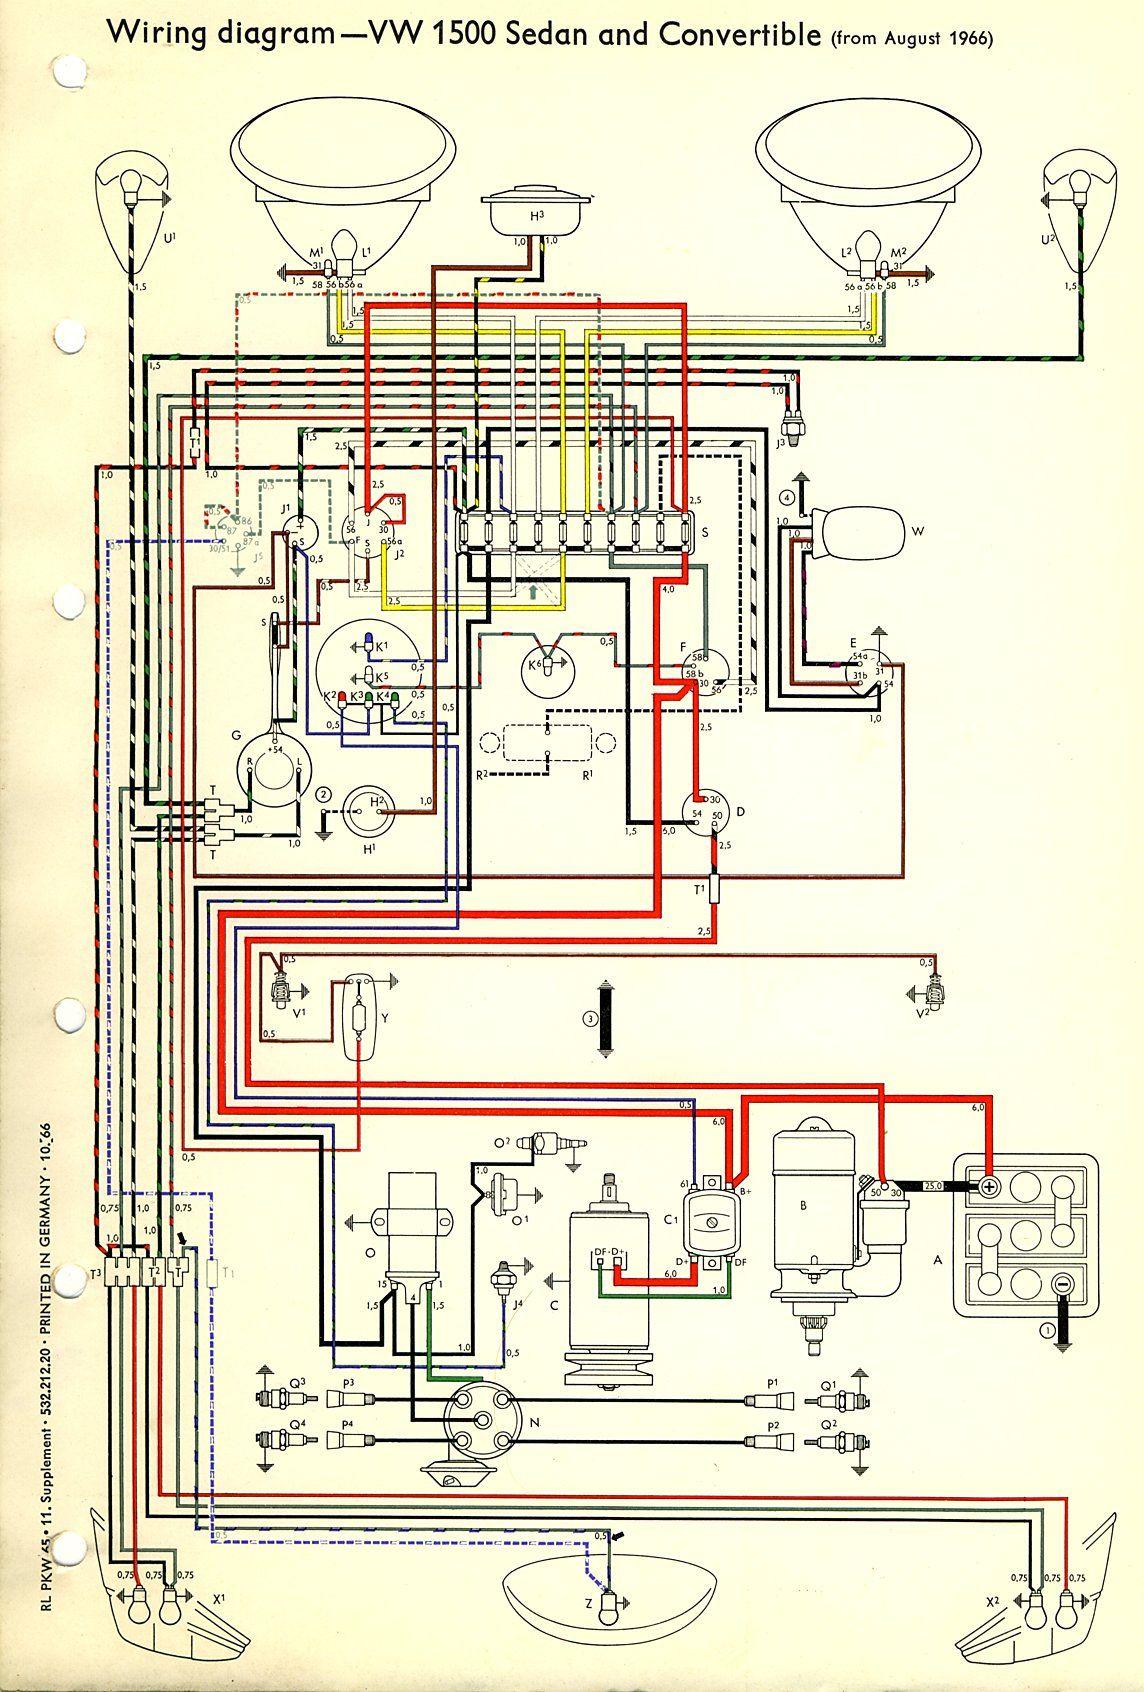 1600 Vw Beetle Engine Wiring Harness